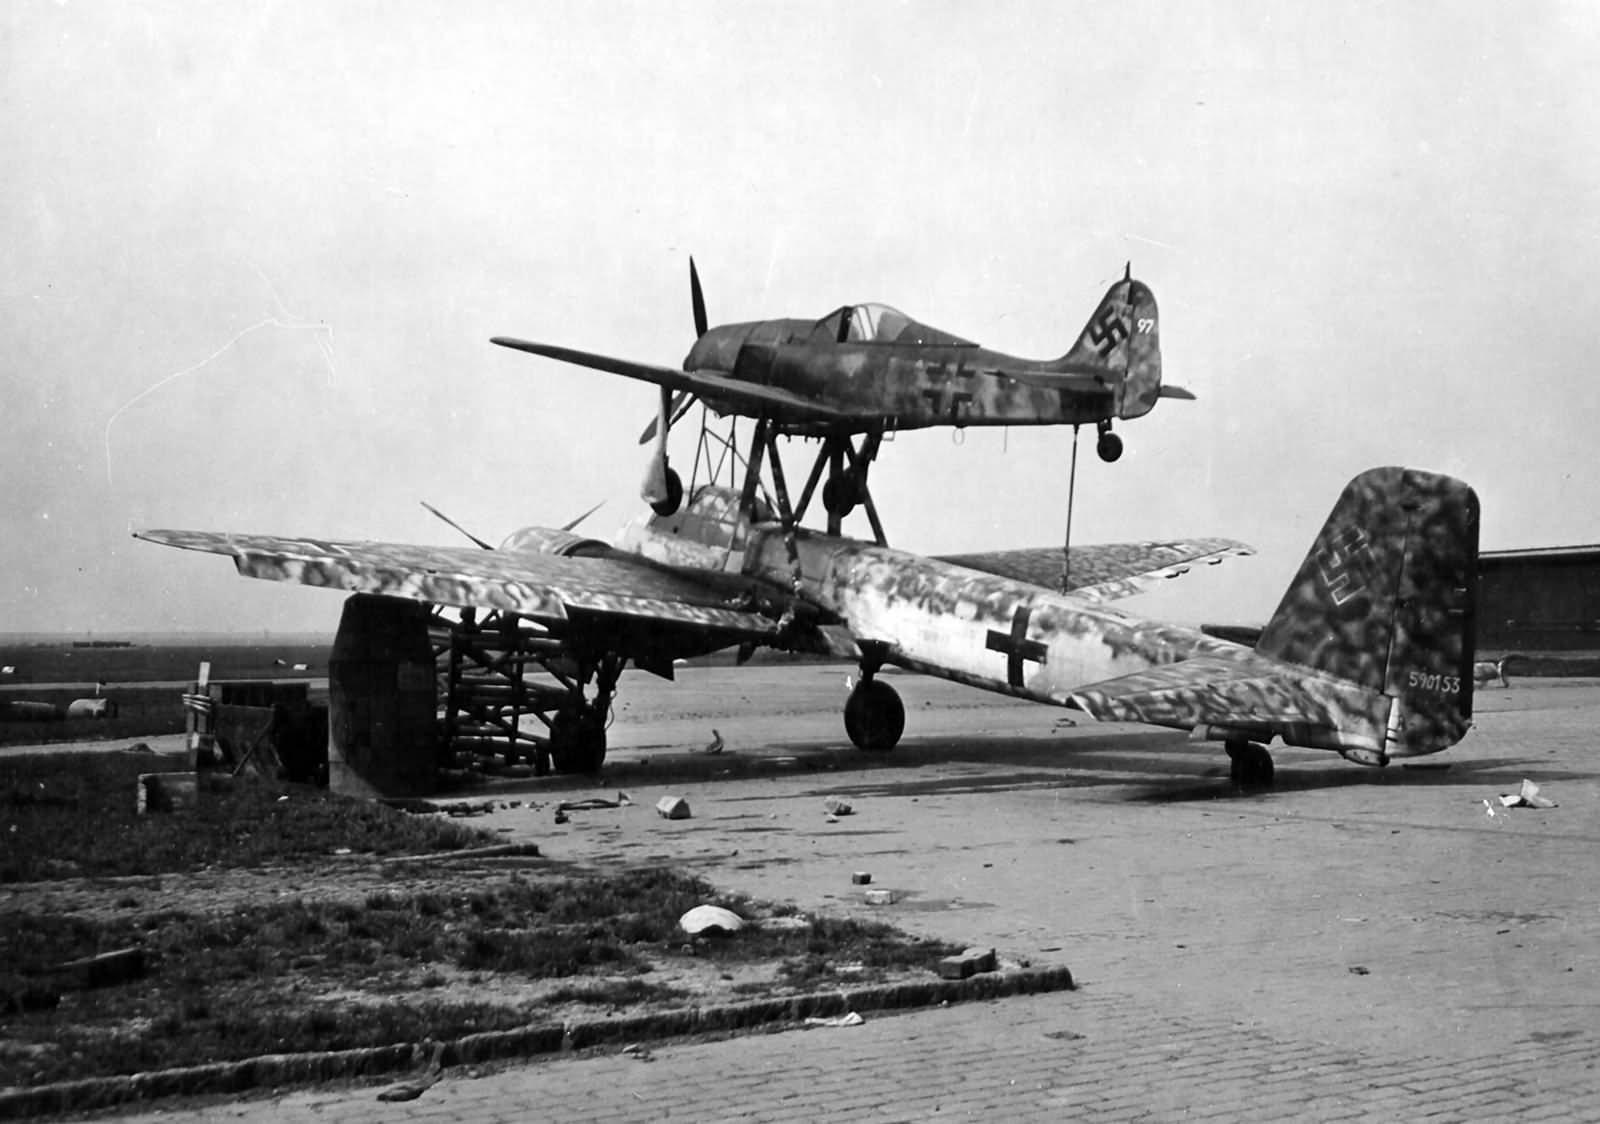 Mistel Fw190 and Ju88 590153 at Merseburg Germany